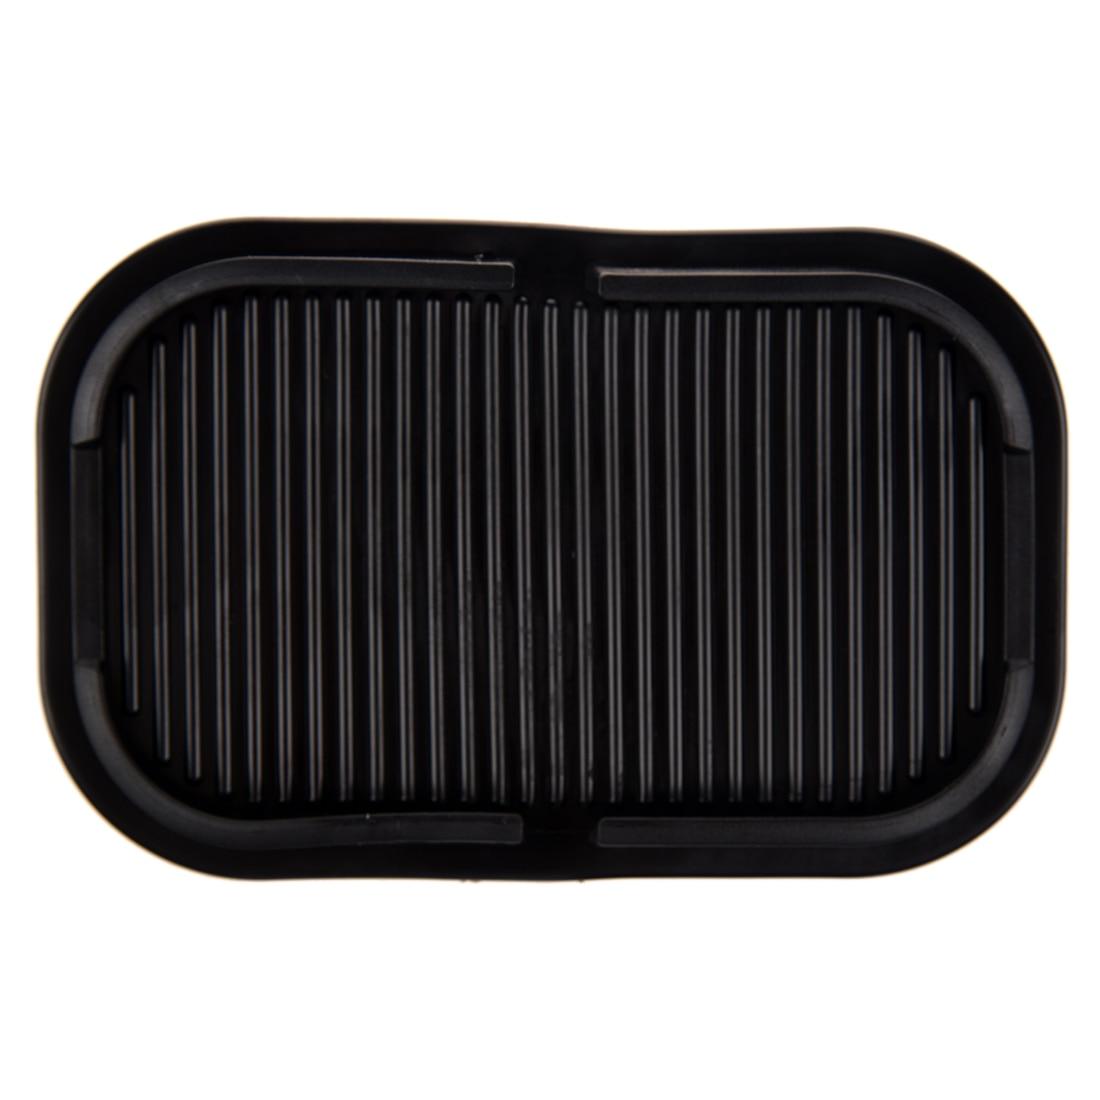 AUTO Black Car Sticky Pad Mat Anti Slip Gadget Mobile Phone Holder